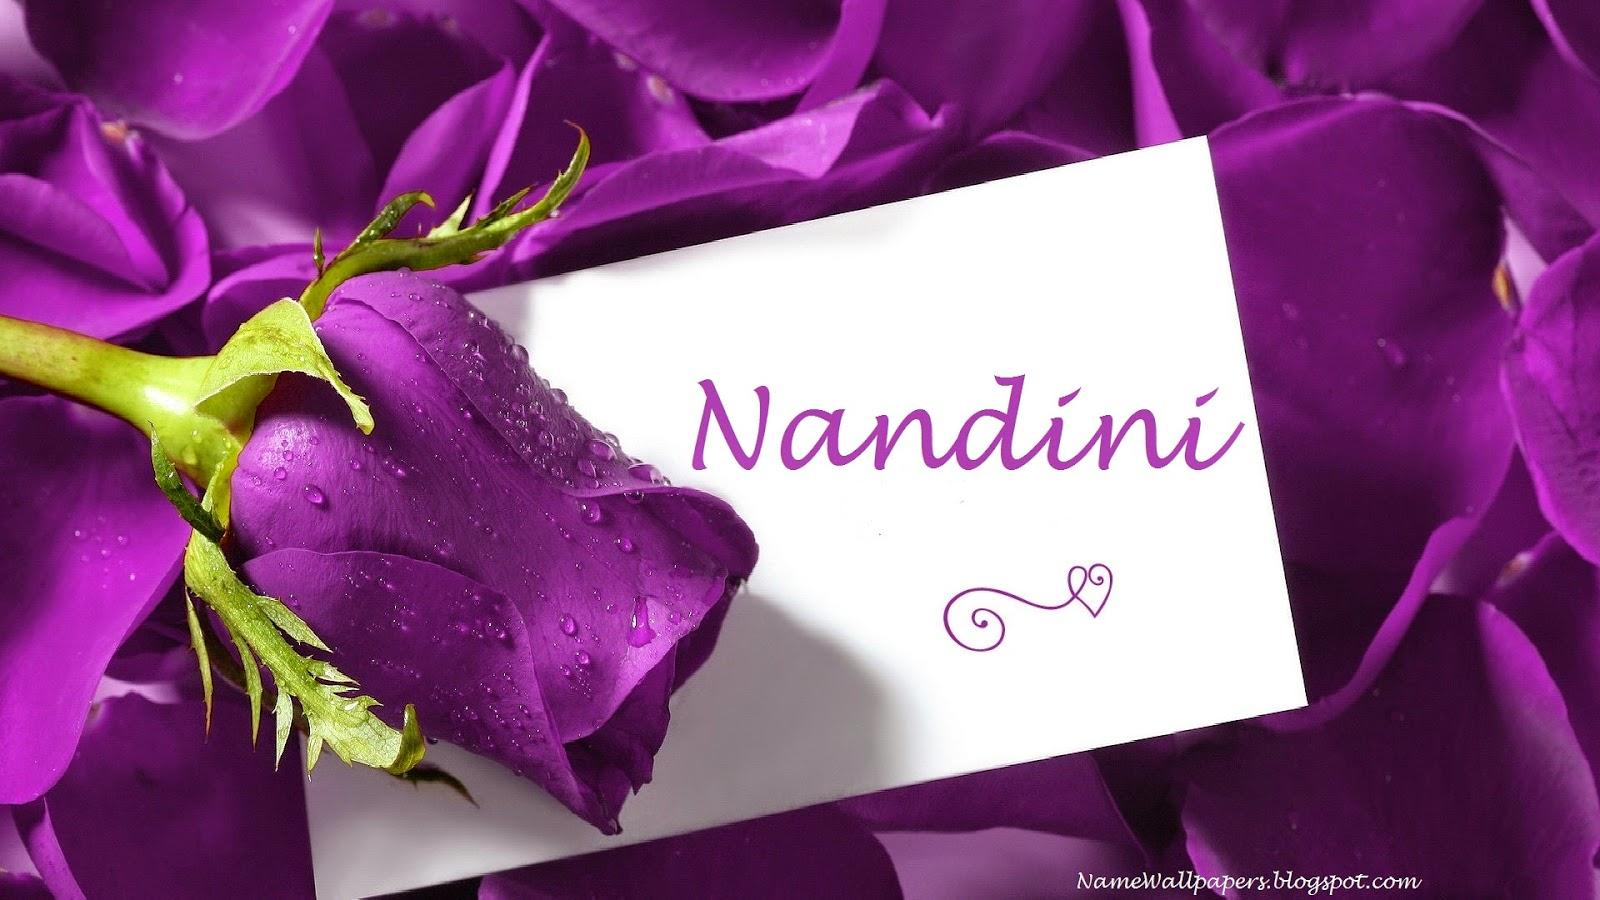 nandini name wallpapers nandini name wallpaper urdu name meaning name images logo signature name wallpaper urdu name meaning name images logo signature